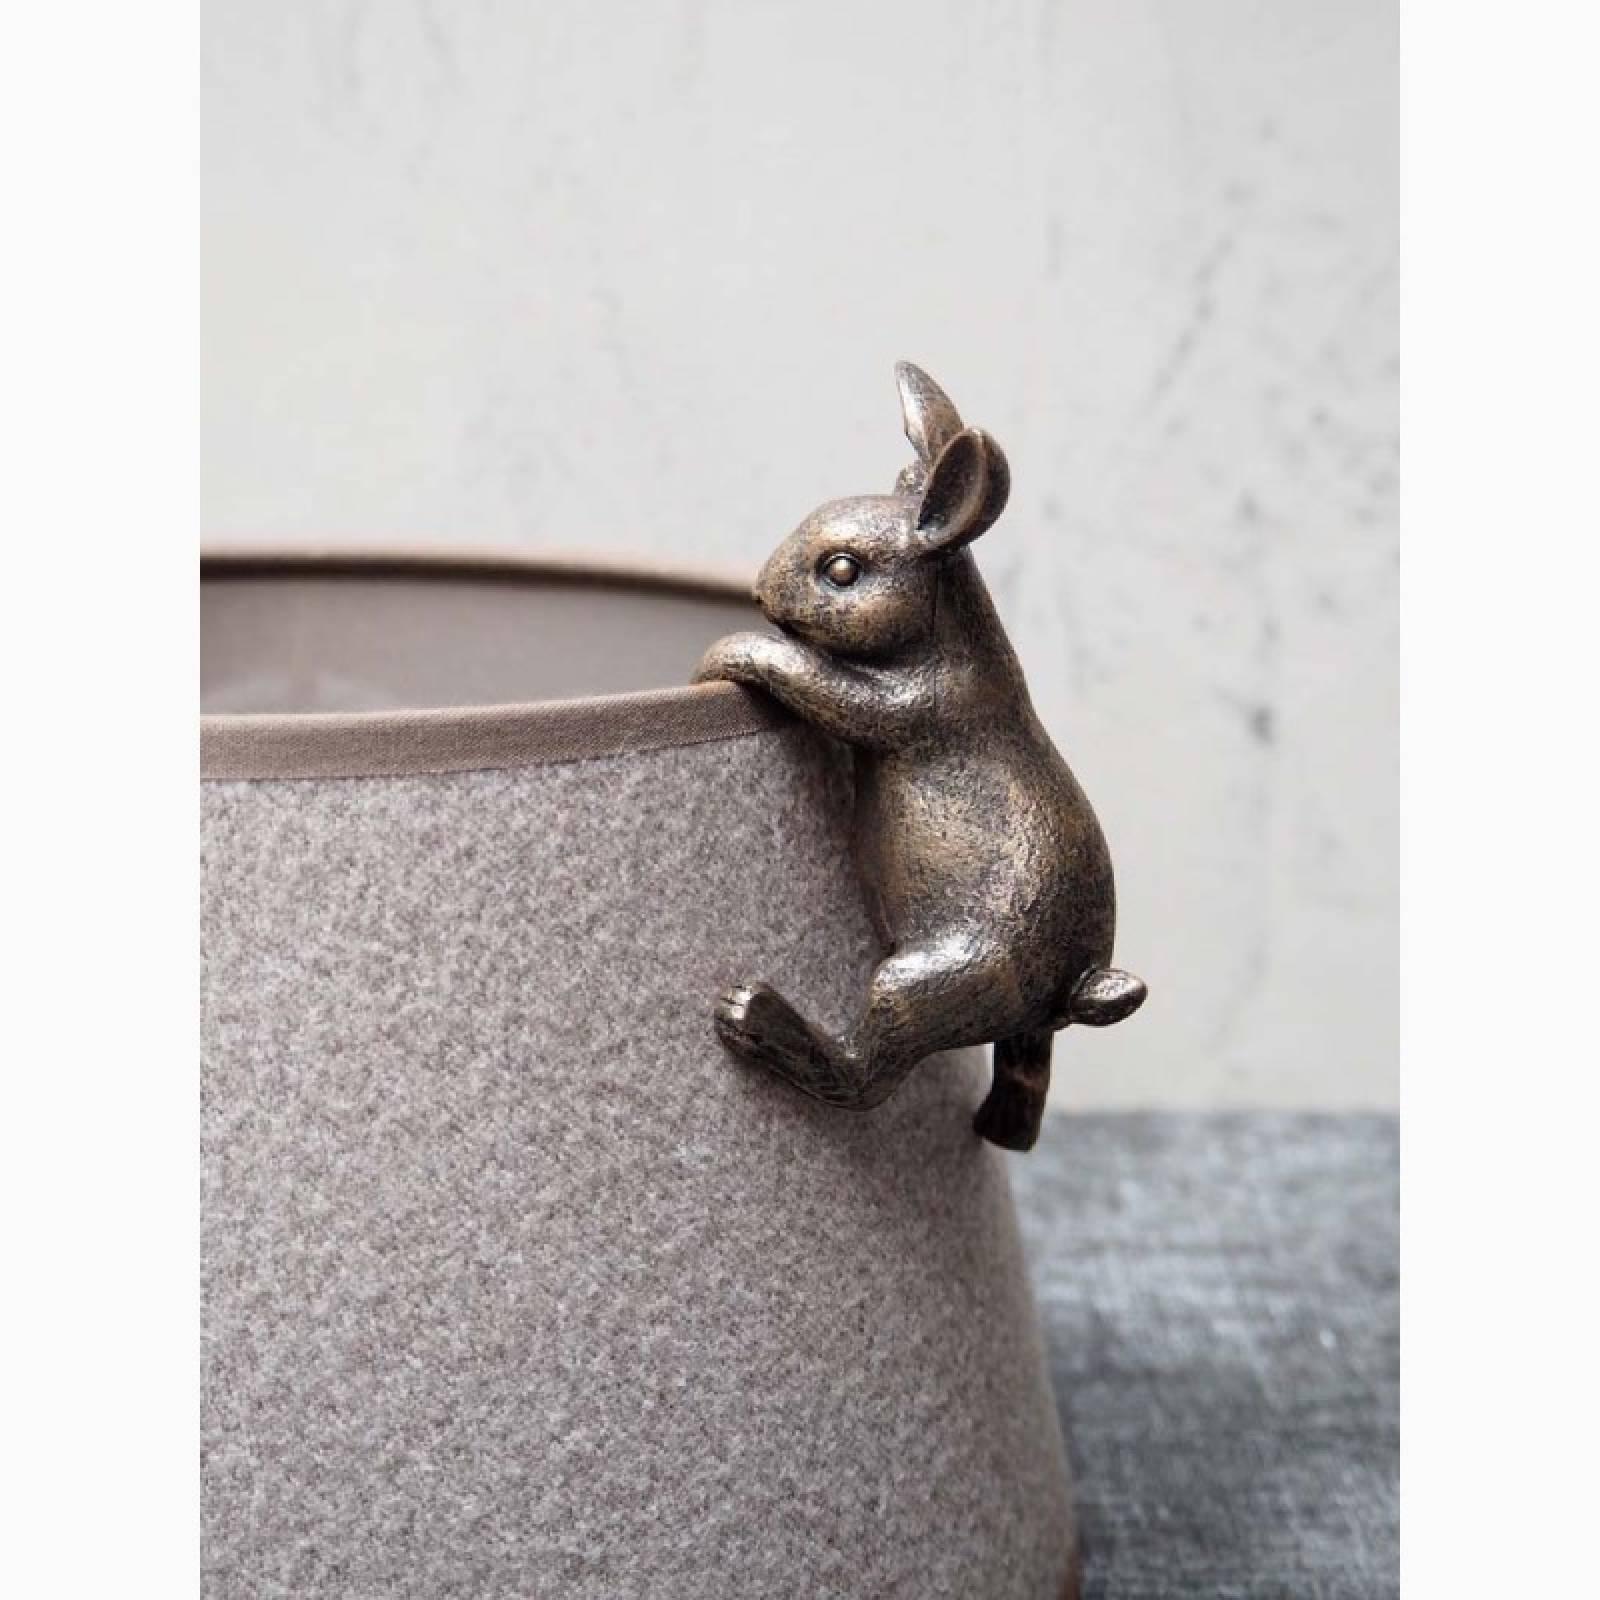 Small Rabbit Plant Pot Hanger Decoration thumbnails